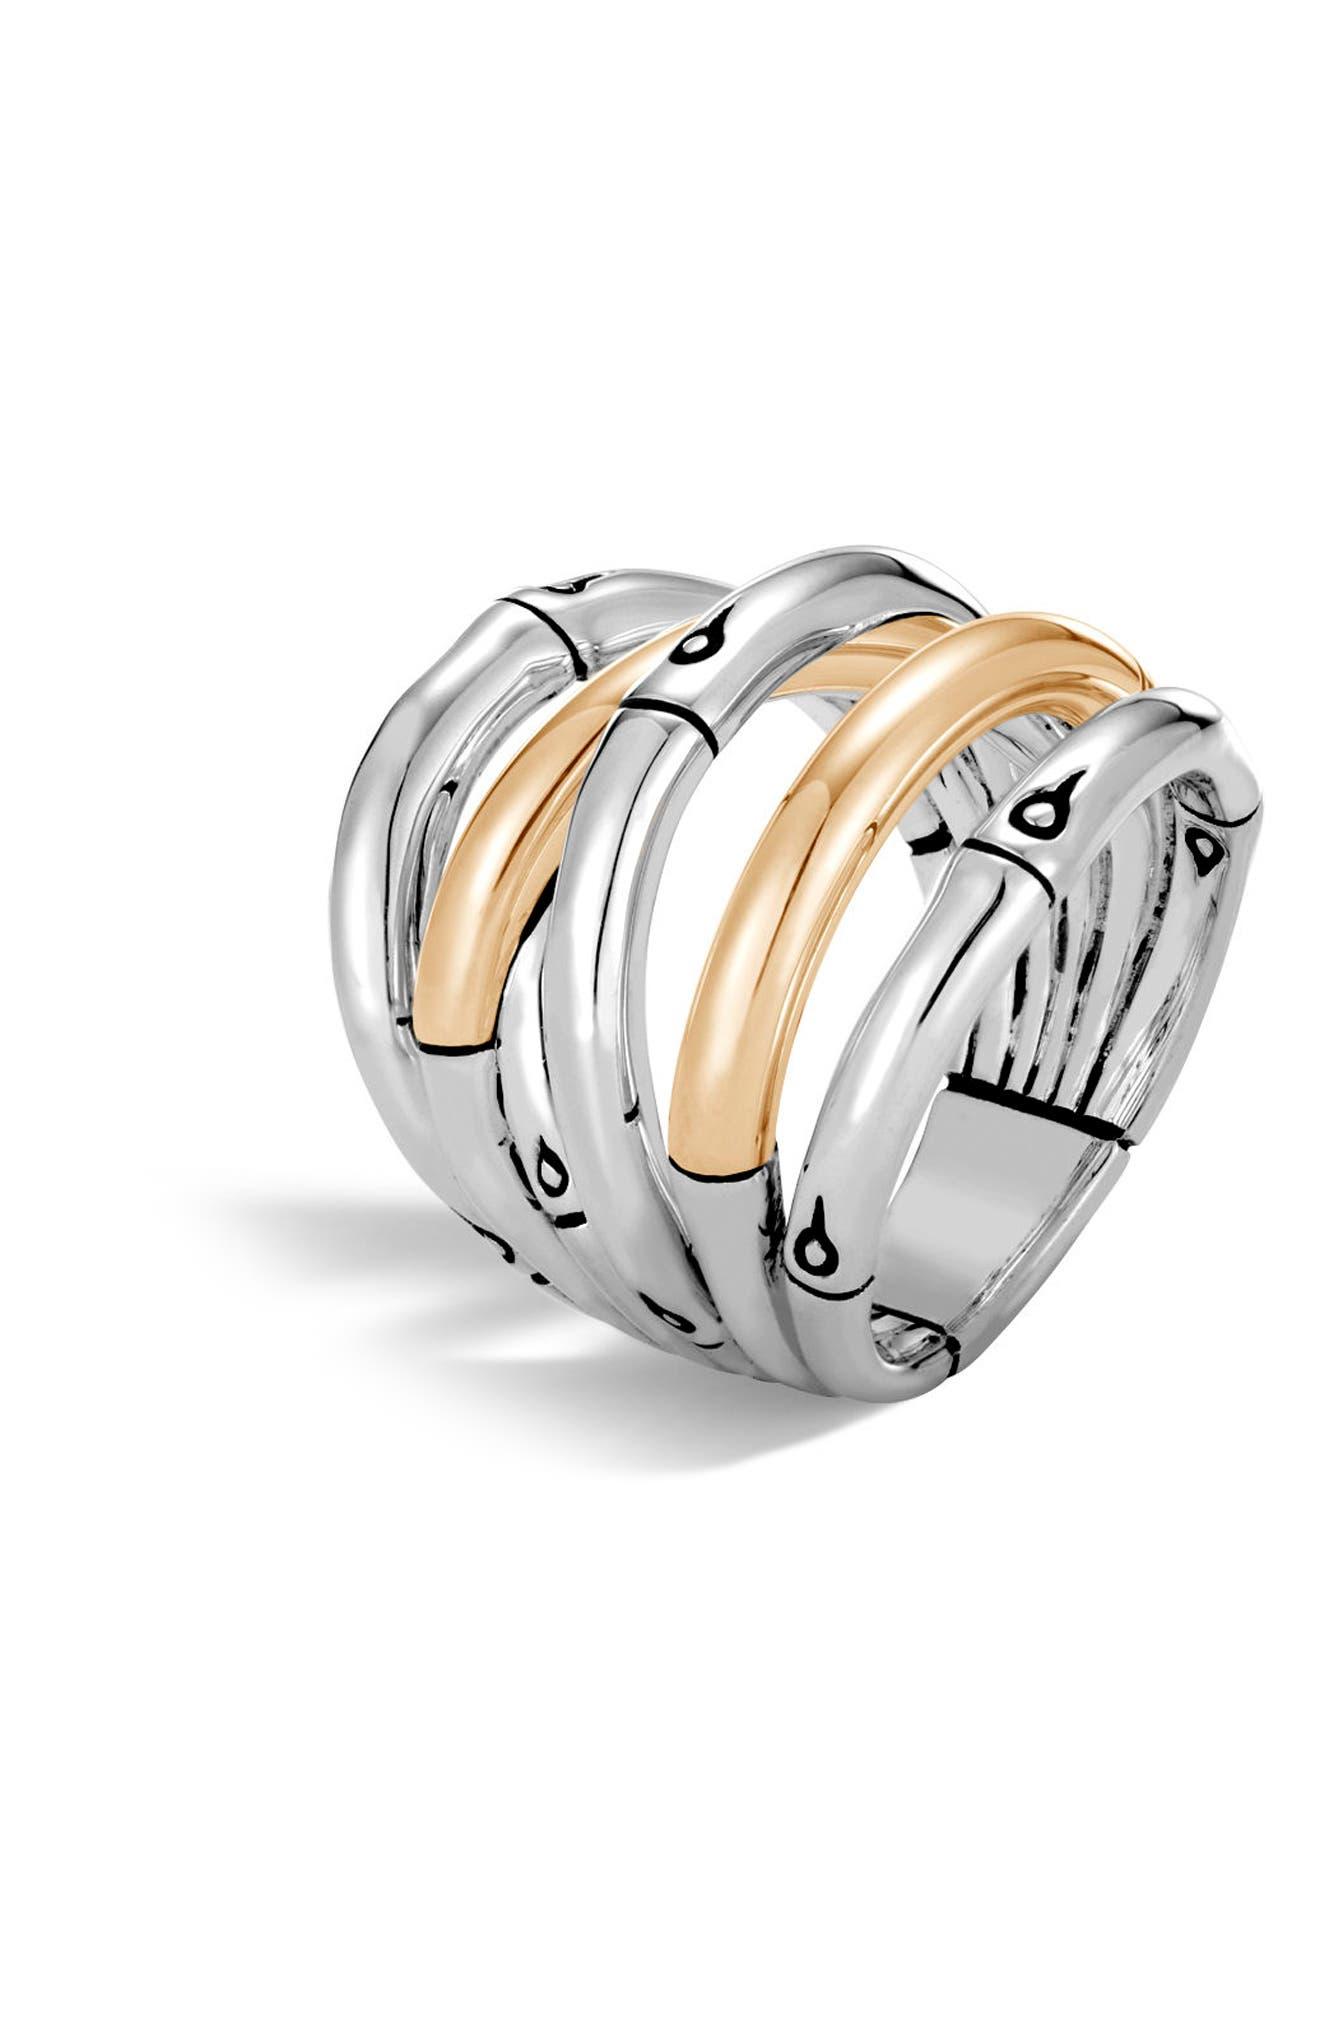 Bamboo 18-Karat Gold Sterling Silver Stack Ring,                             Main thumbnail 1, color,                             SILVER/ GOLD